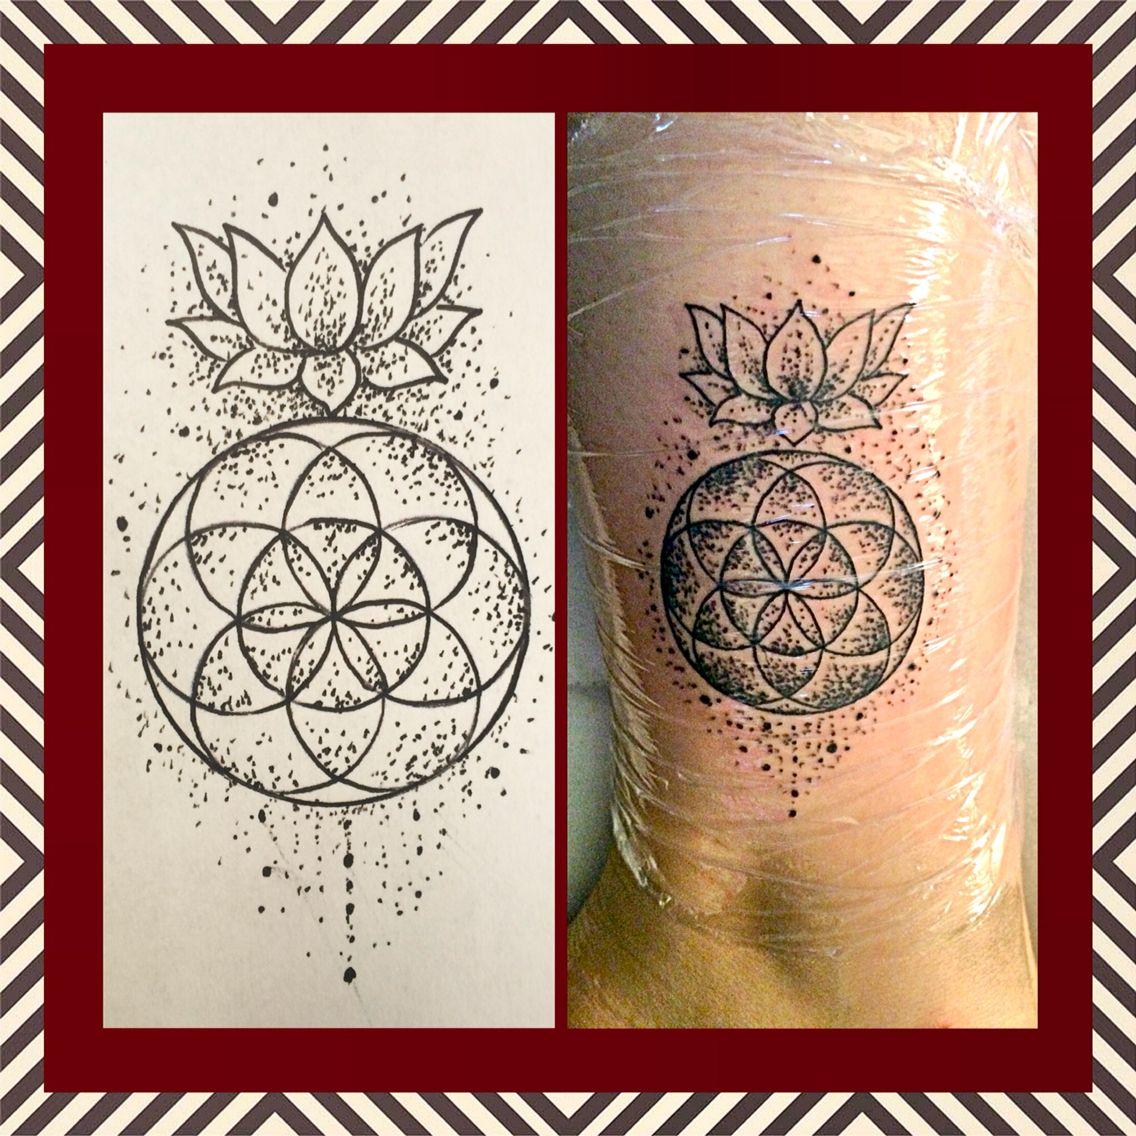 Lotus Tattoo My Tattoo Flower Of Life Tattoo Unique Tattoo Blume Des Lebens Tattoo Lebensblume Tattoo Spirituelle Tattoos